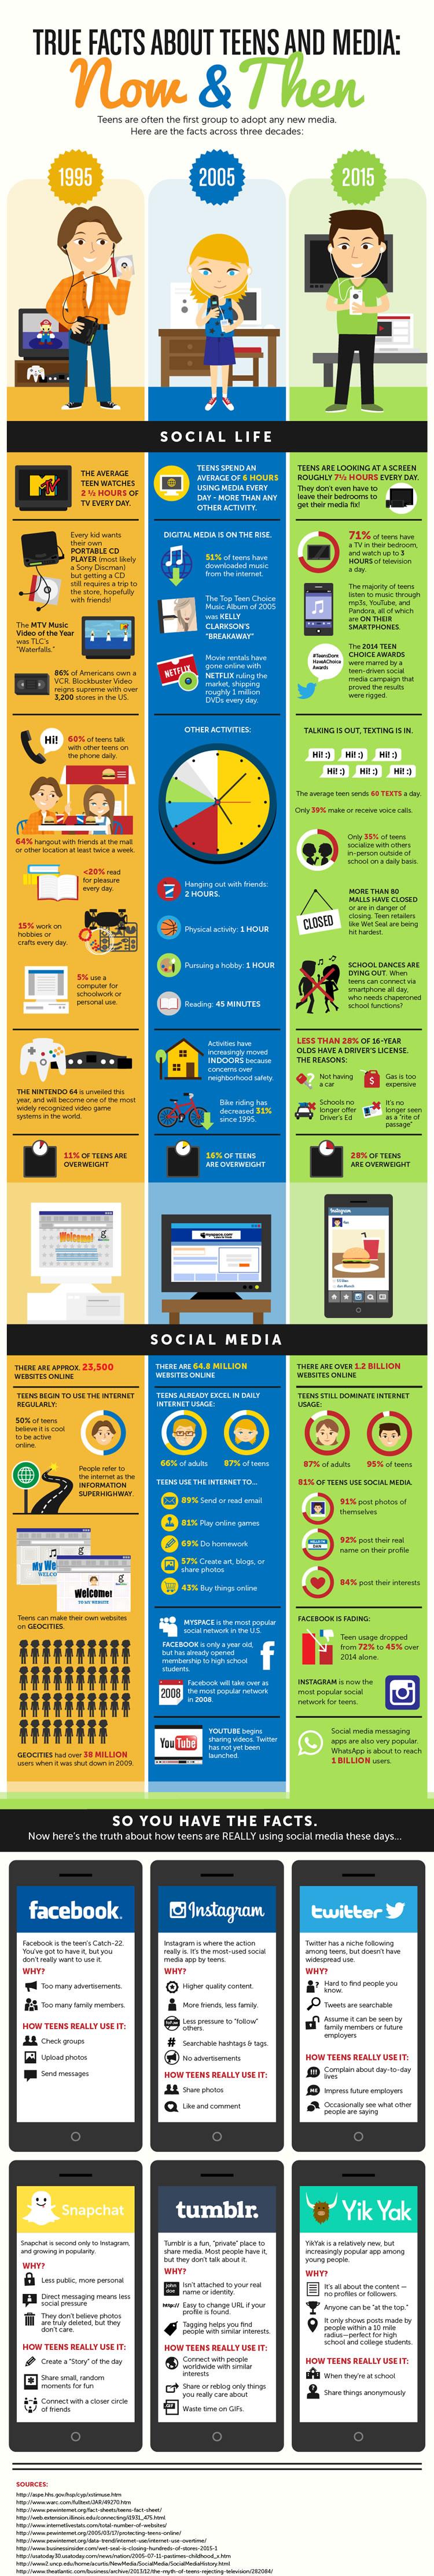 Changing faces of social media platforms